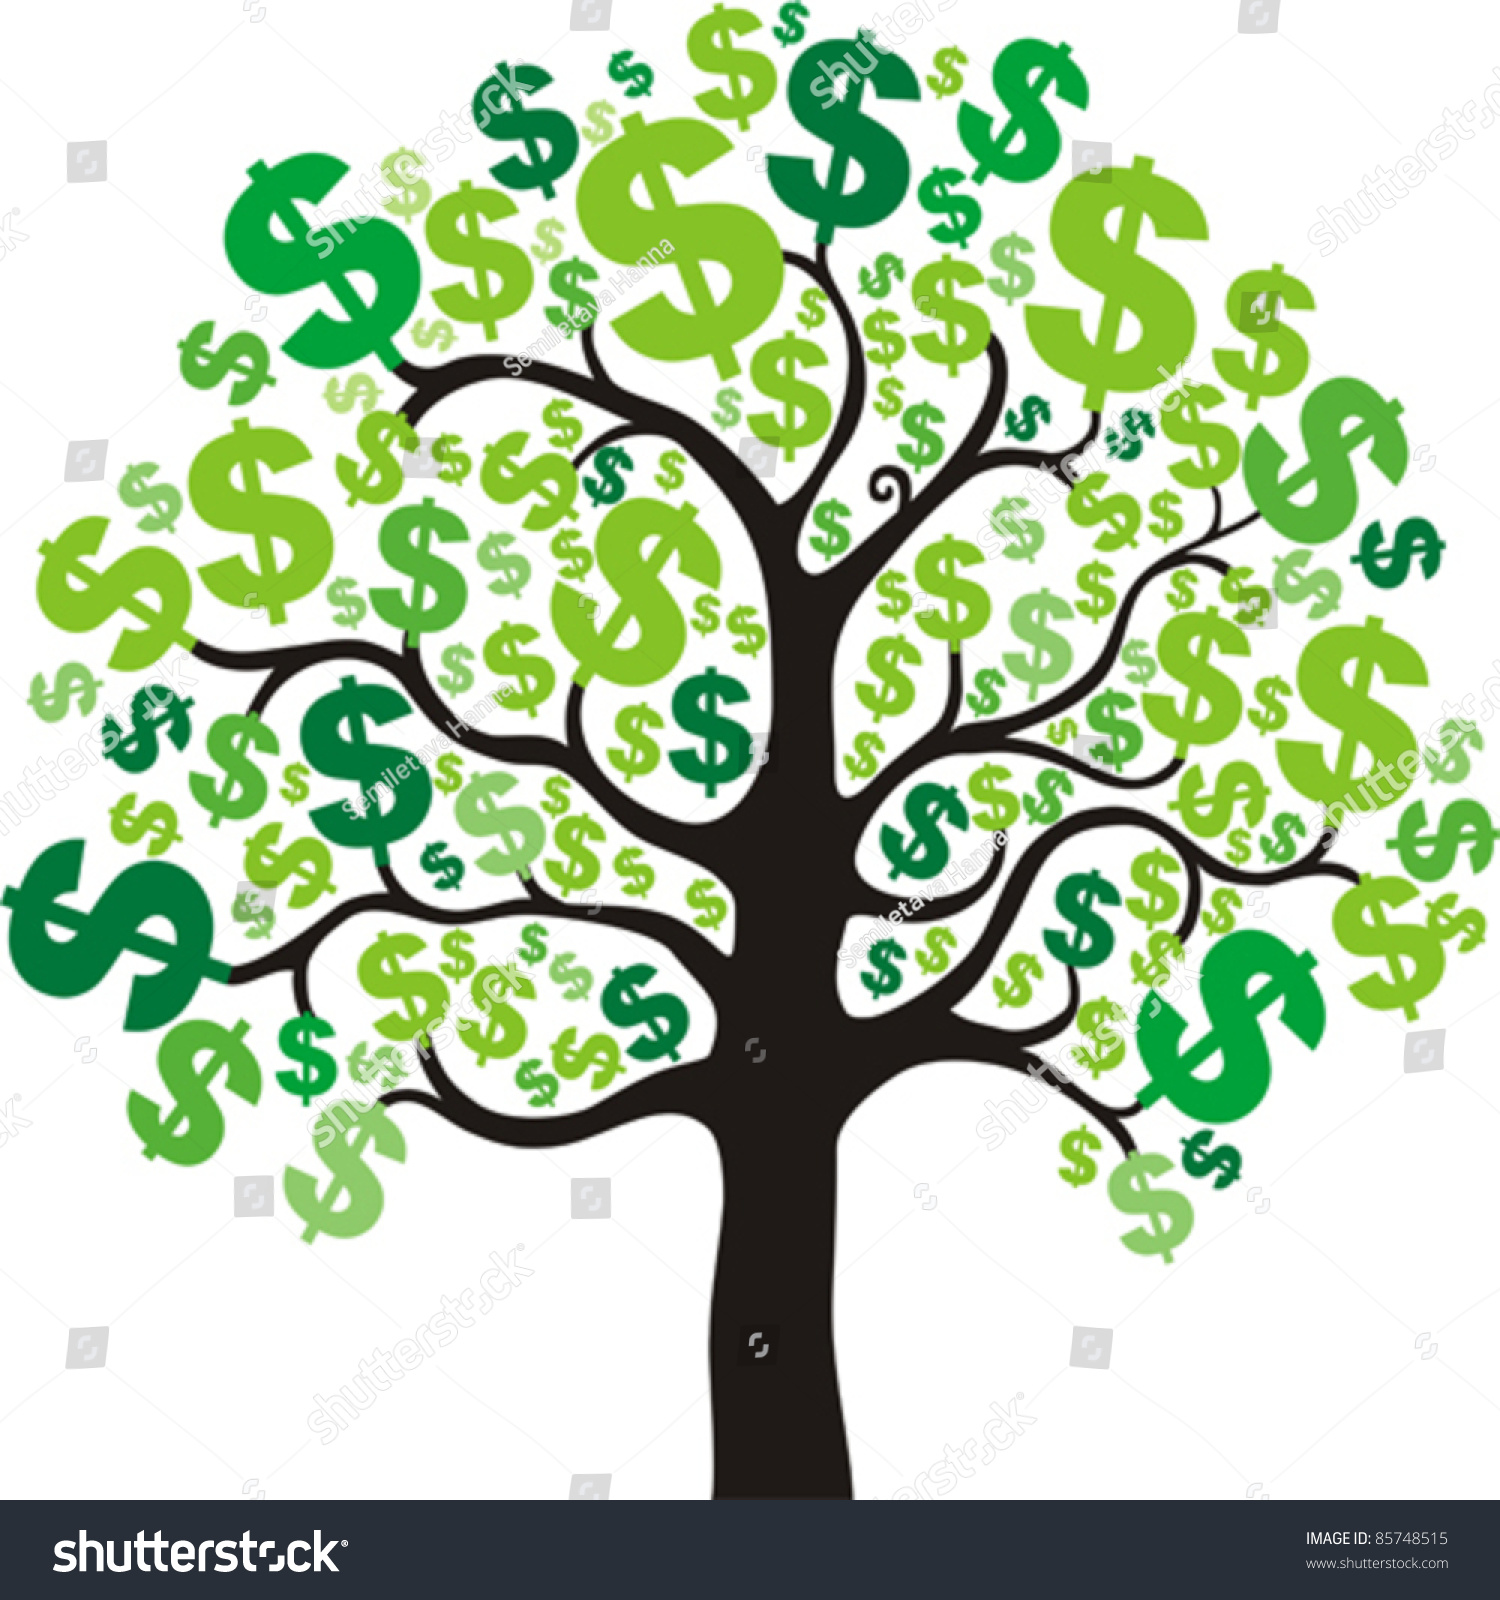 Money Tree Isolated On White Background Stock Vector 85748515 ...